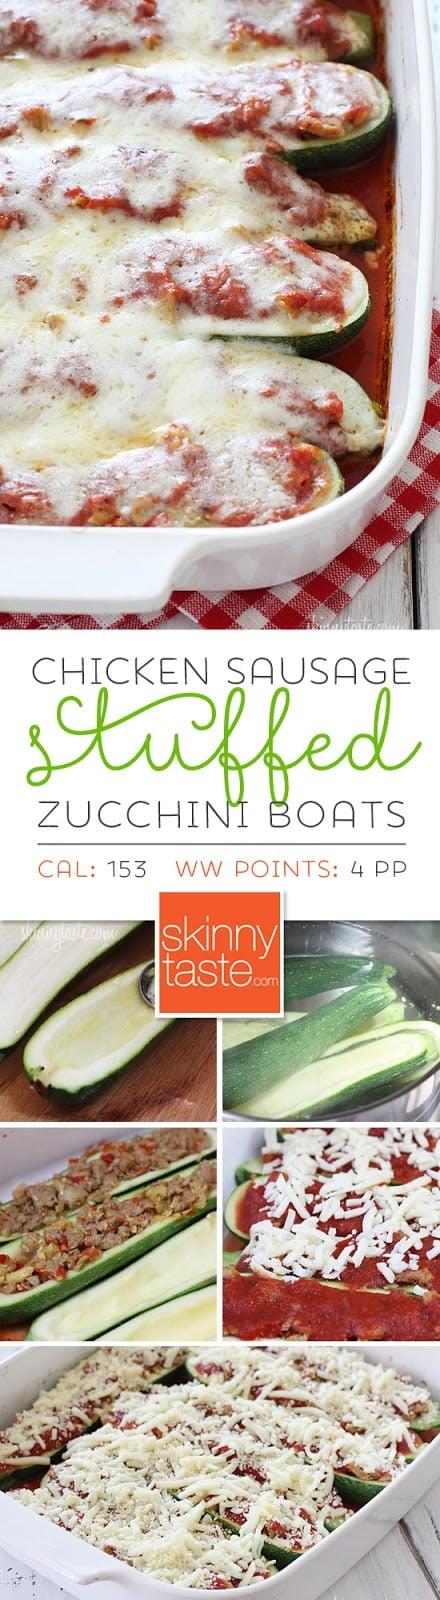 Sausage Stuffed Zucchini Boats – my favorite LOW-CARB summer recipe!